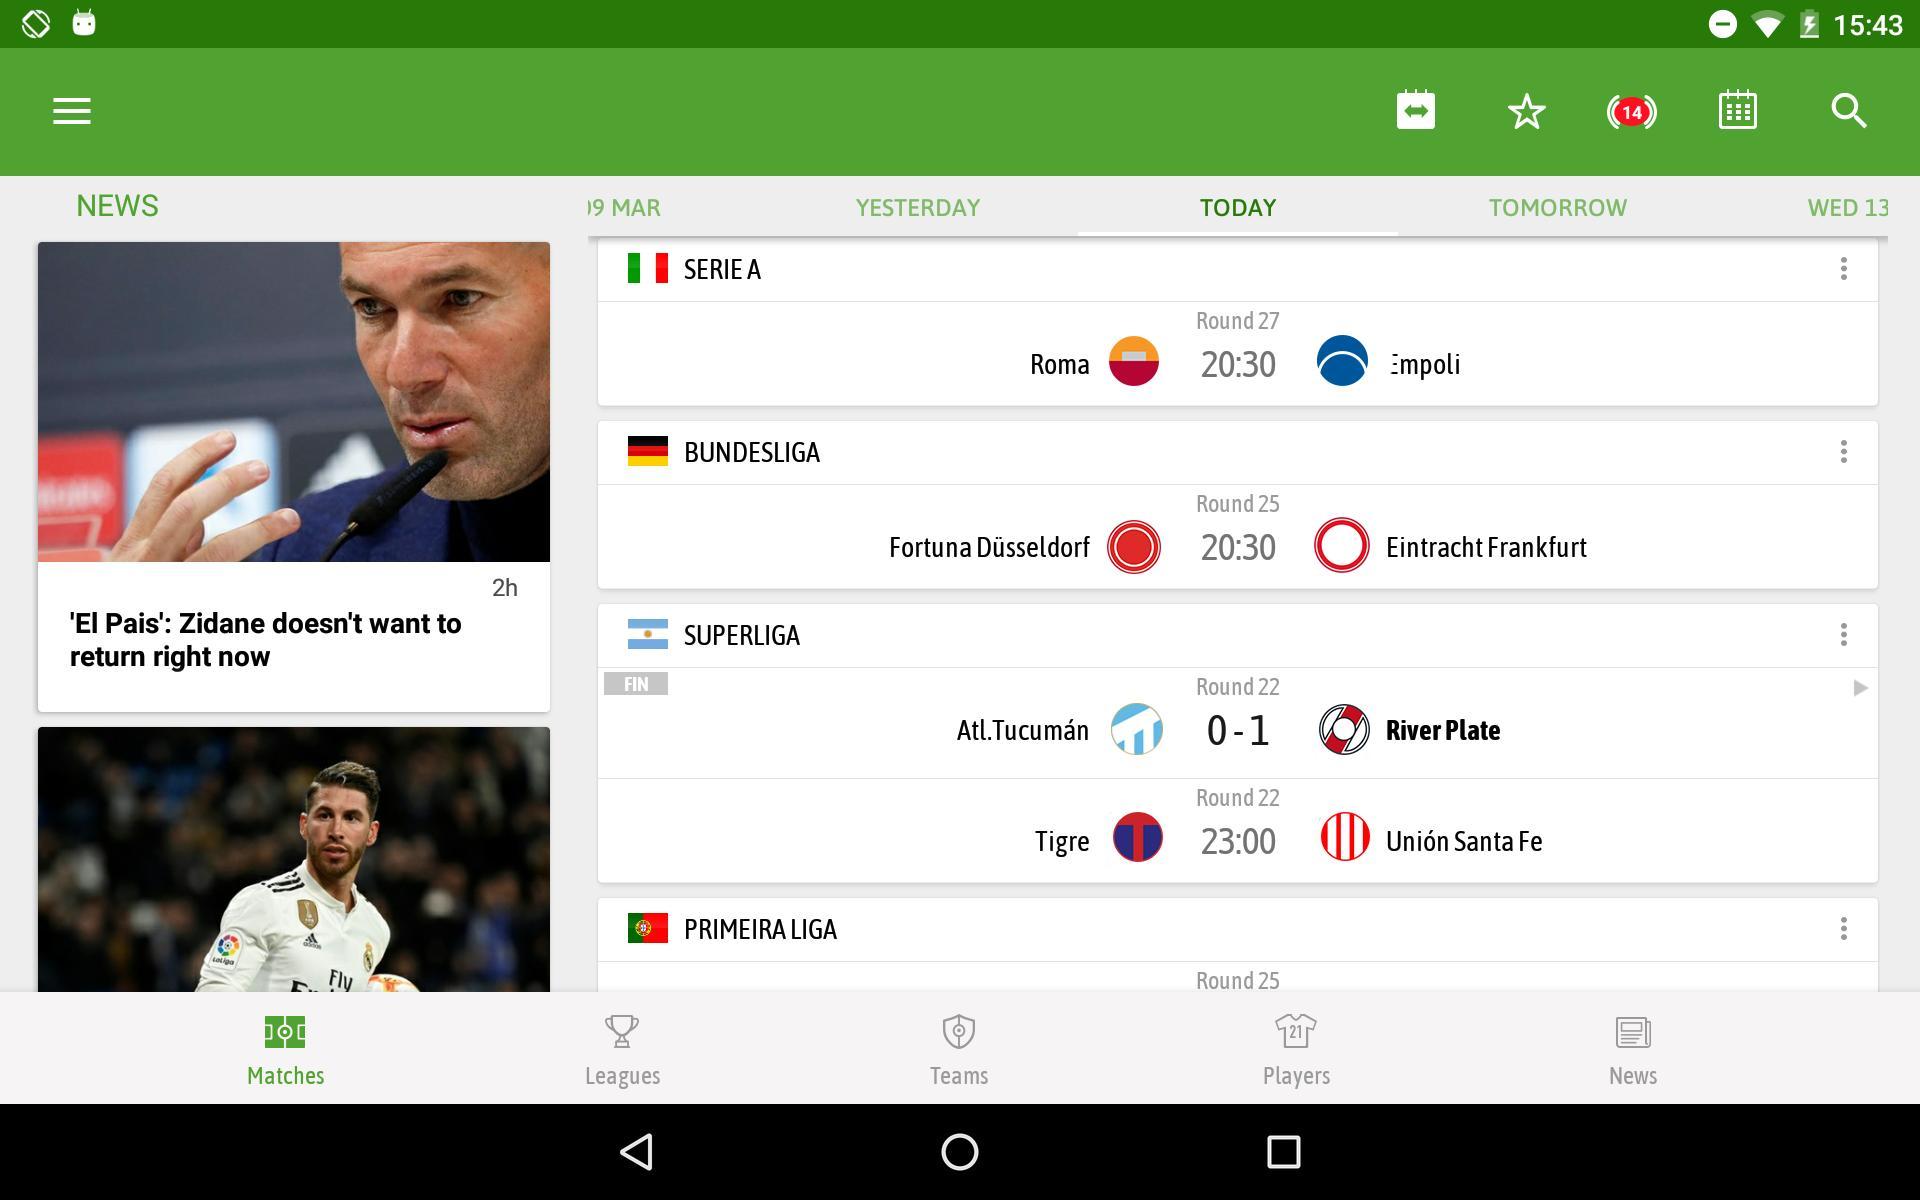 BeSoccer Soccer Live Score 5.2.2.1 Screenshot 12